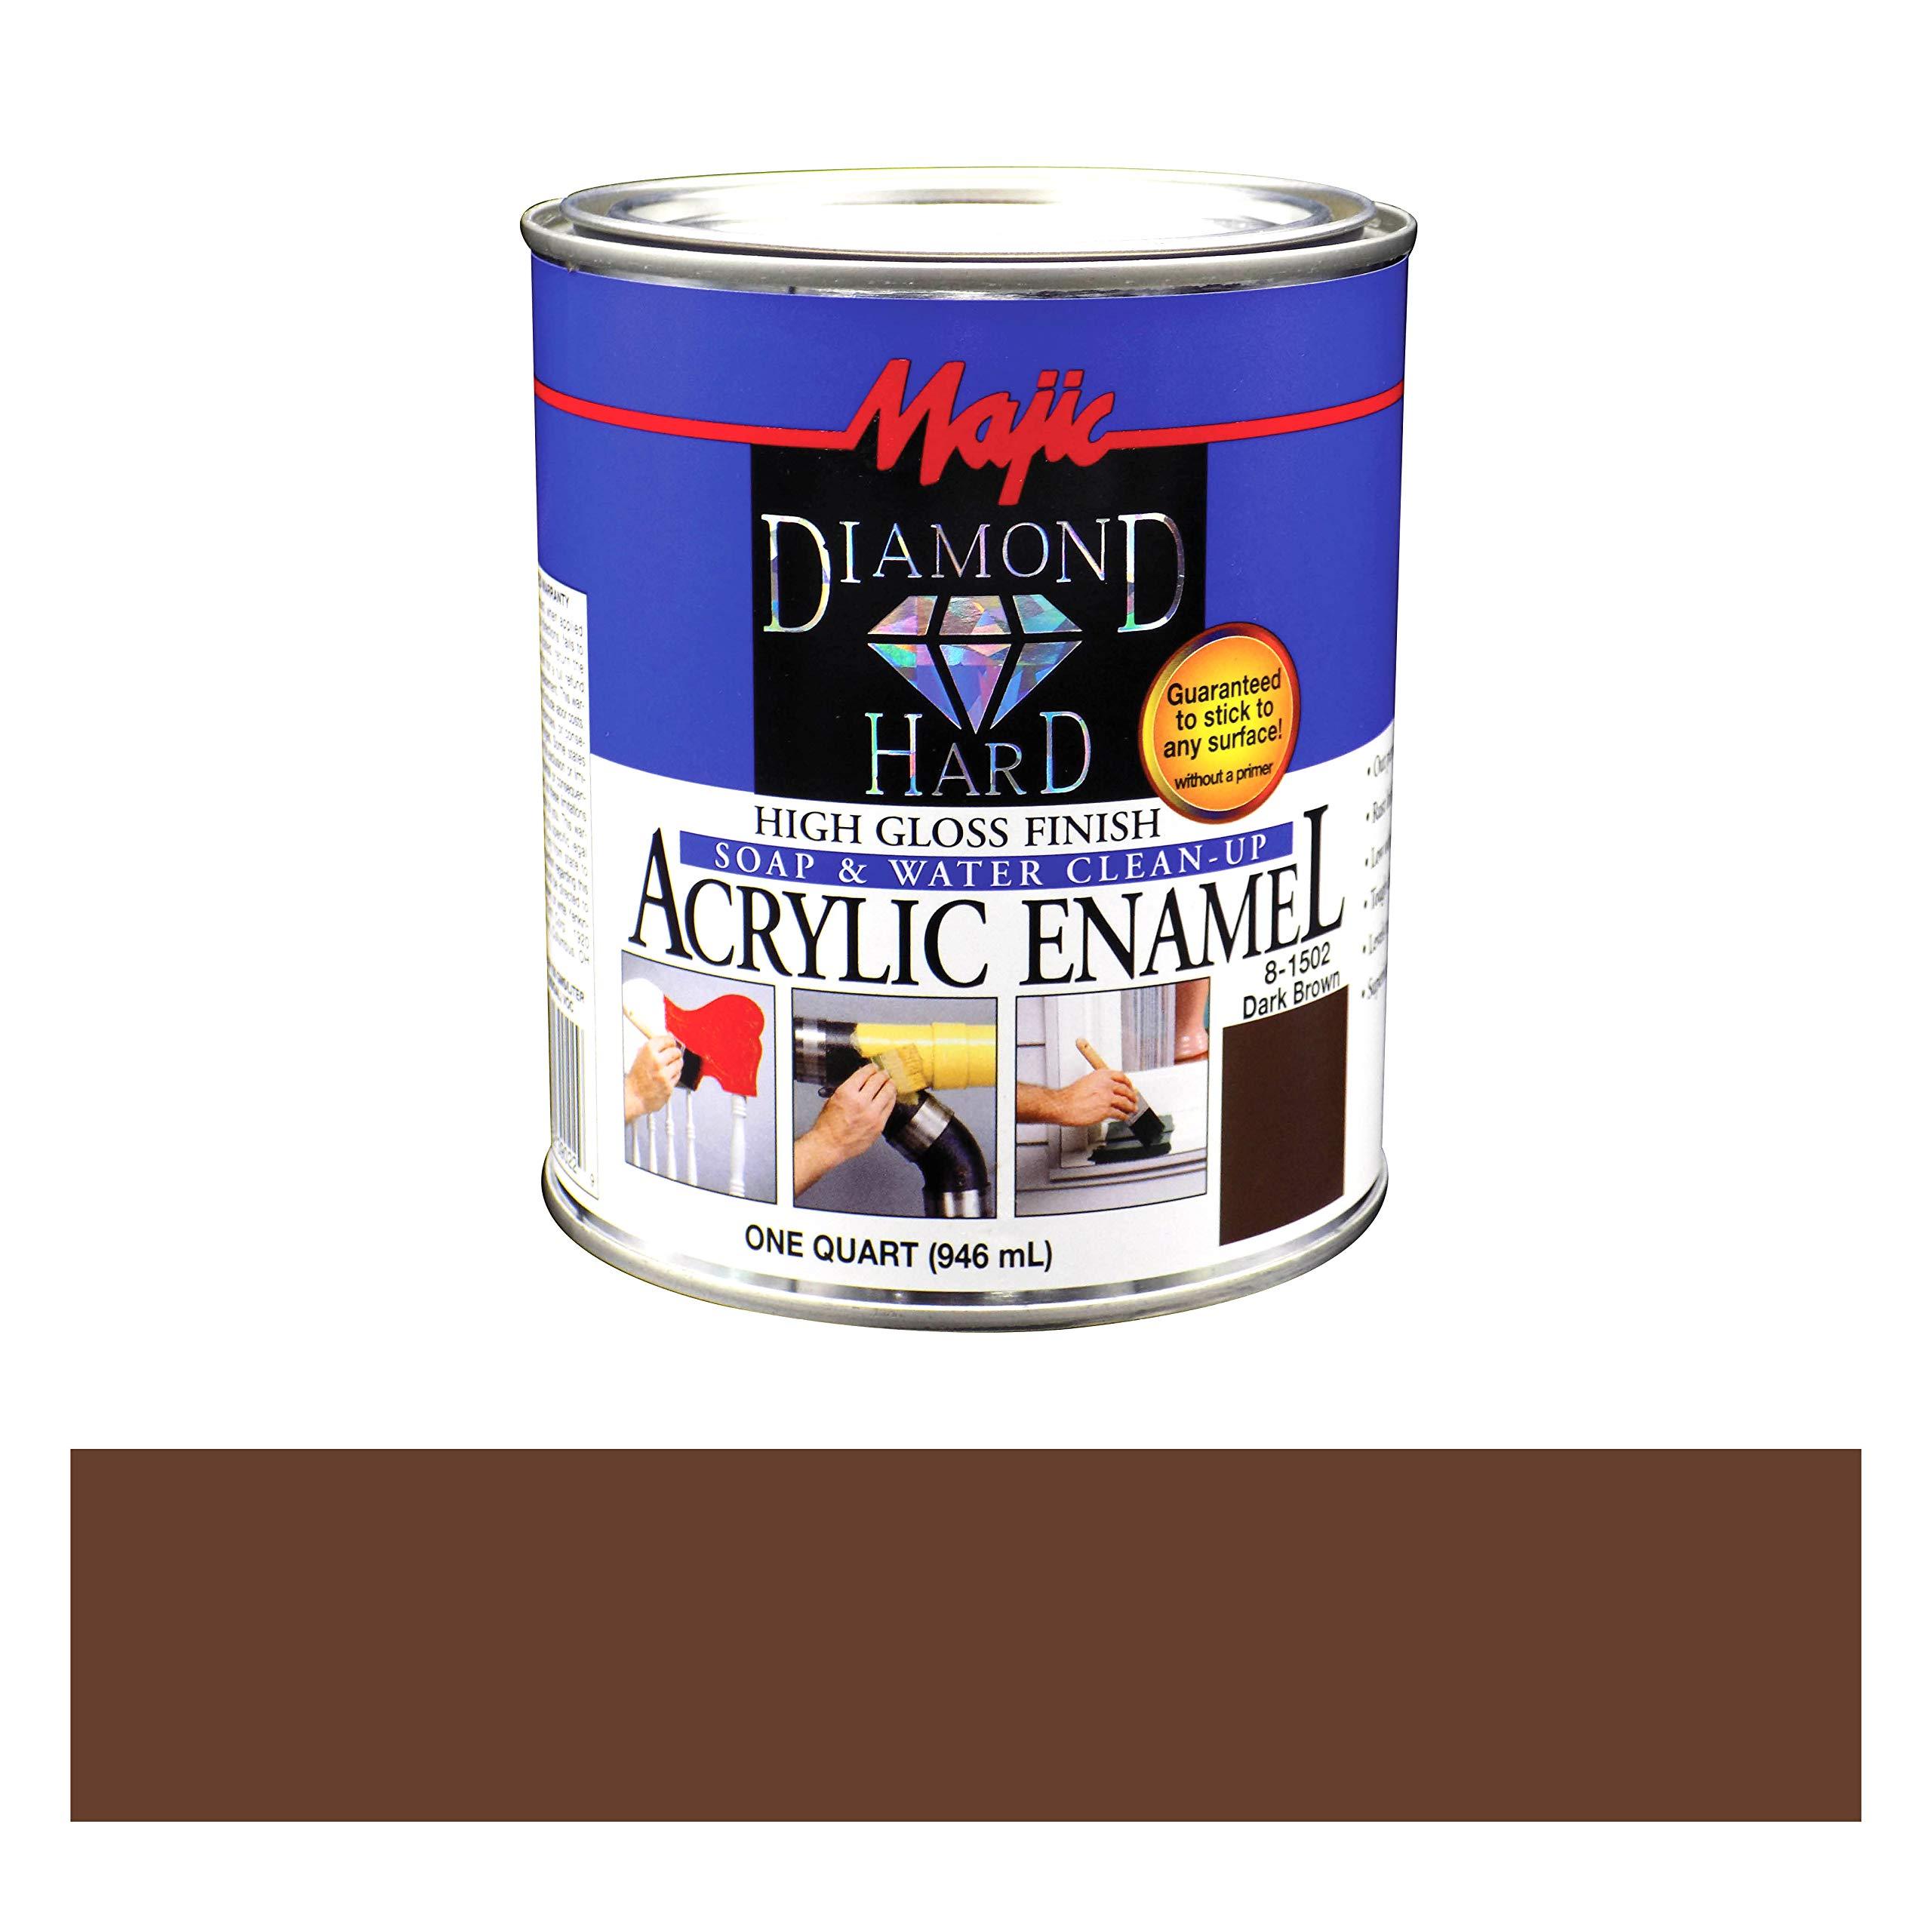 Majic Paints 8-1502-2 Diamond Hard Acrylic Enamel High Gloss Paint, 1- Quart, Dark Brown